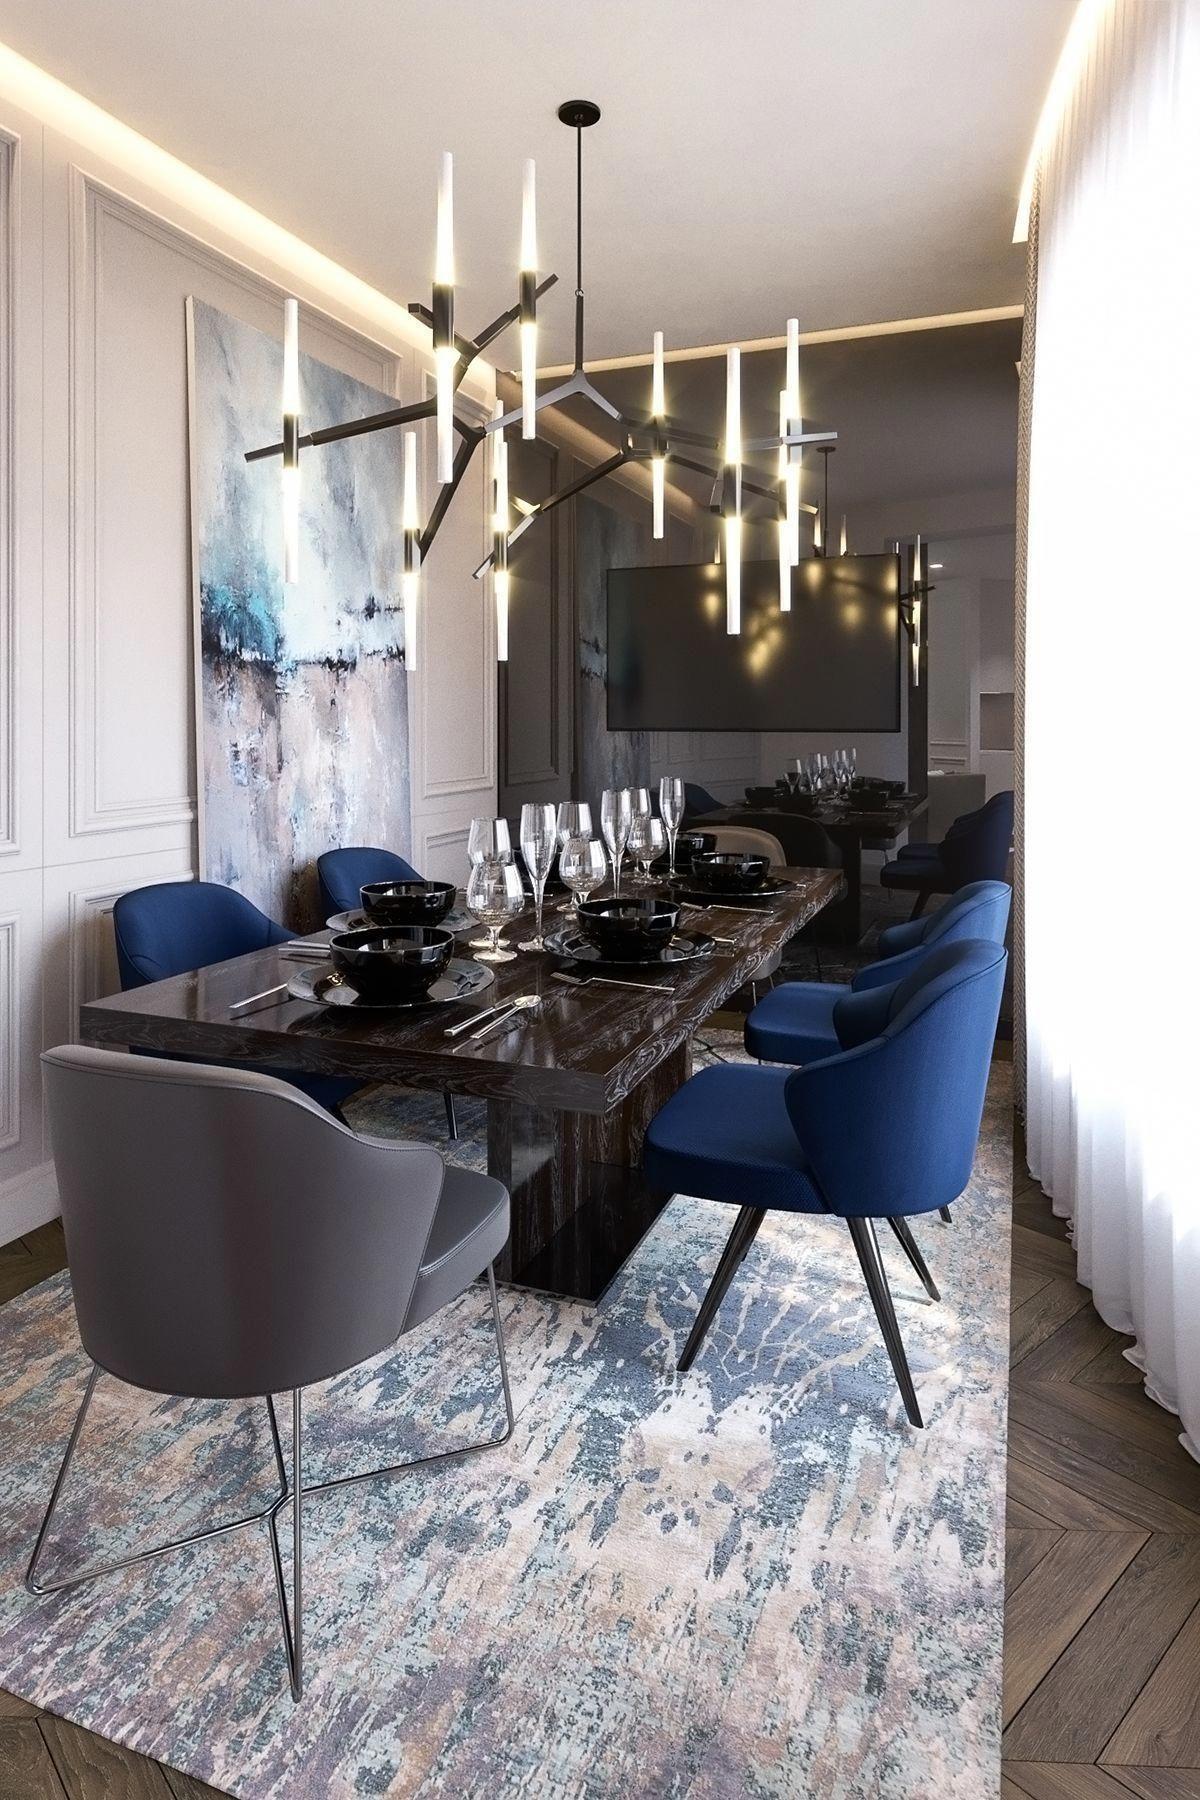 Affordable Modern Home Decor Homedecormodern Dining Room Small Living Room Lighting Contemporary Living Room